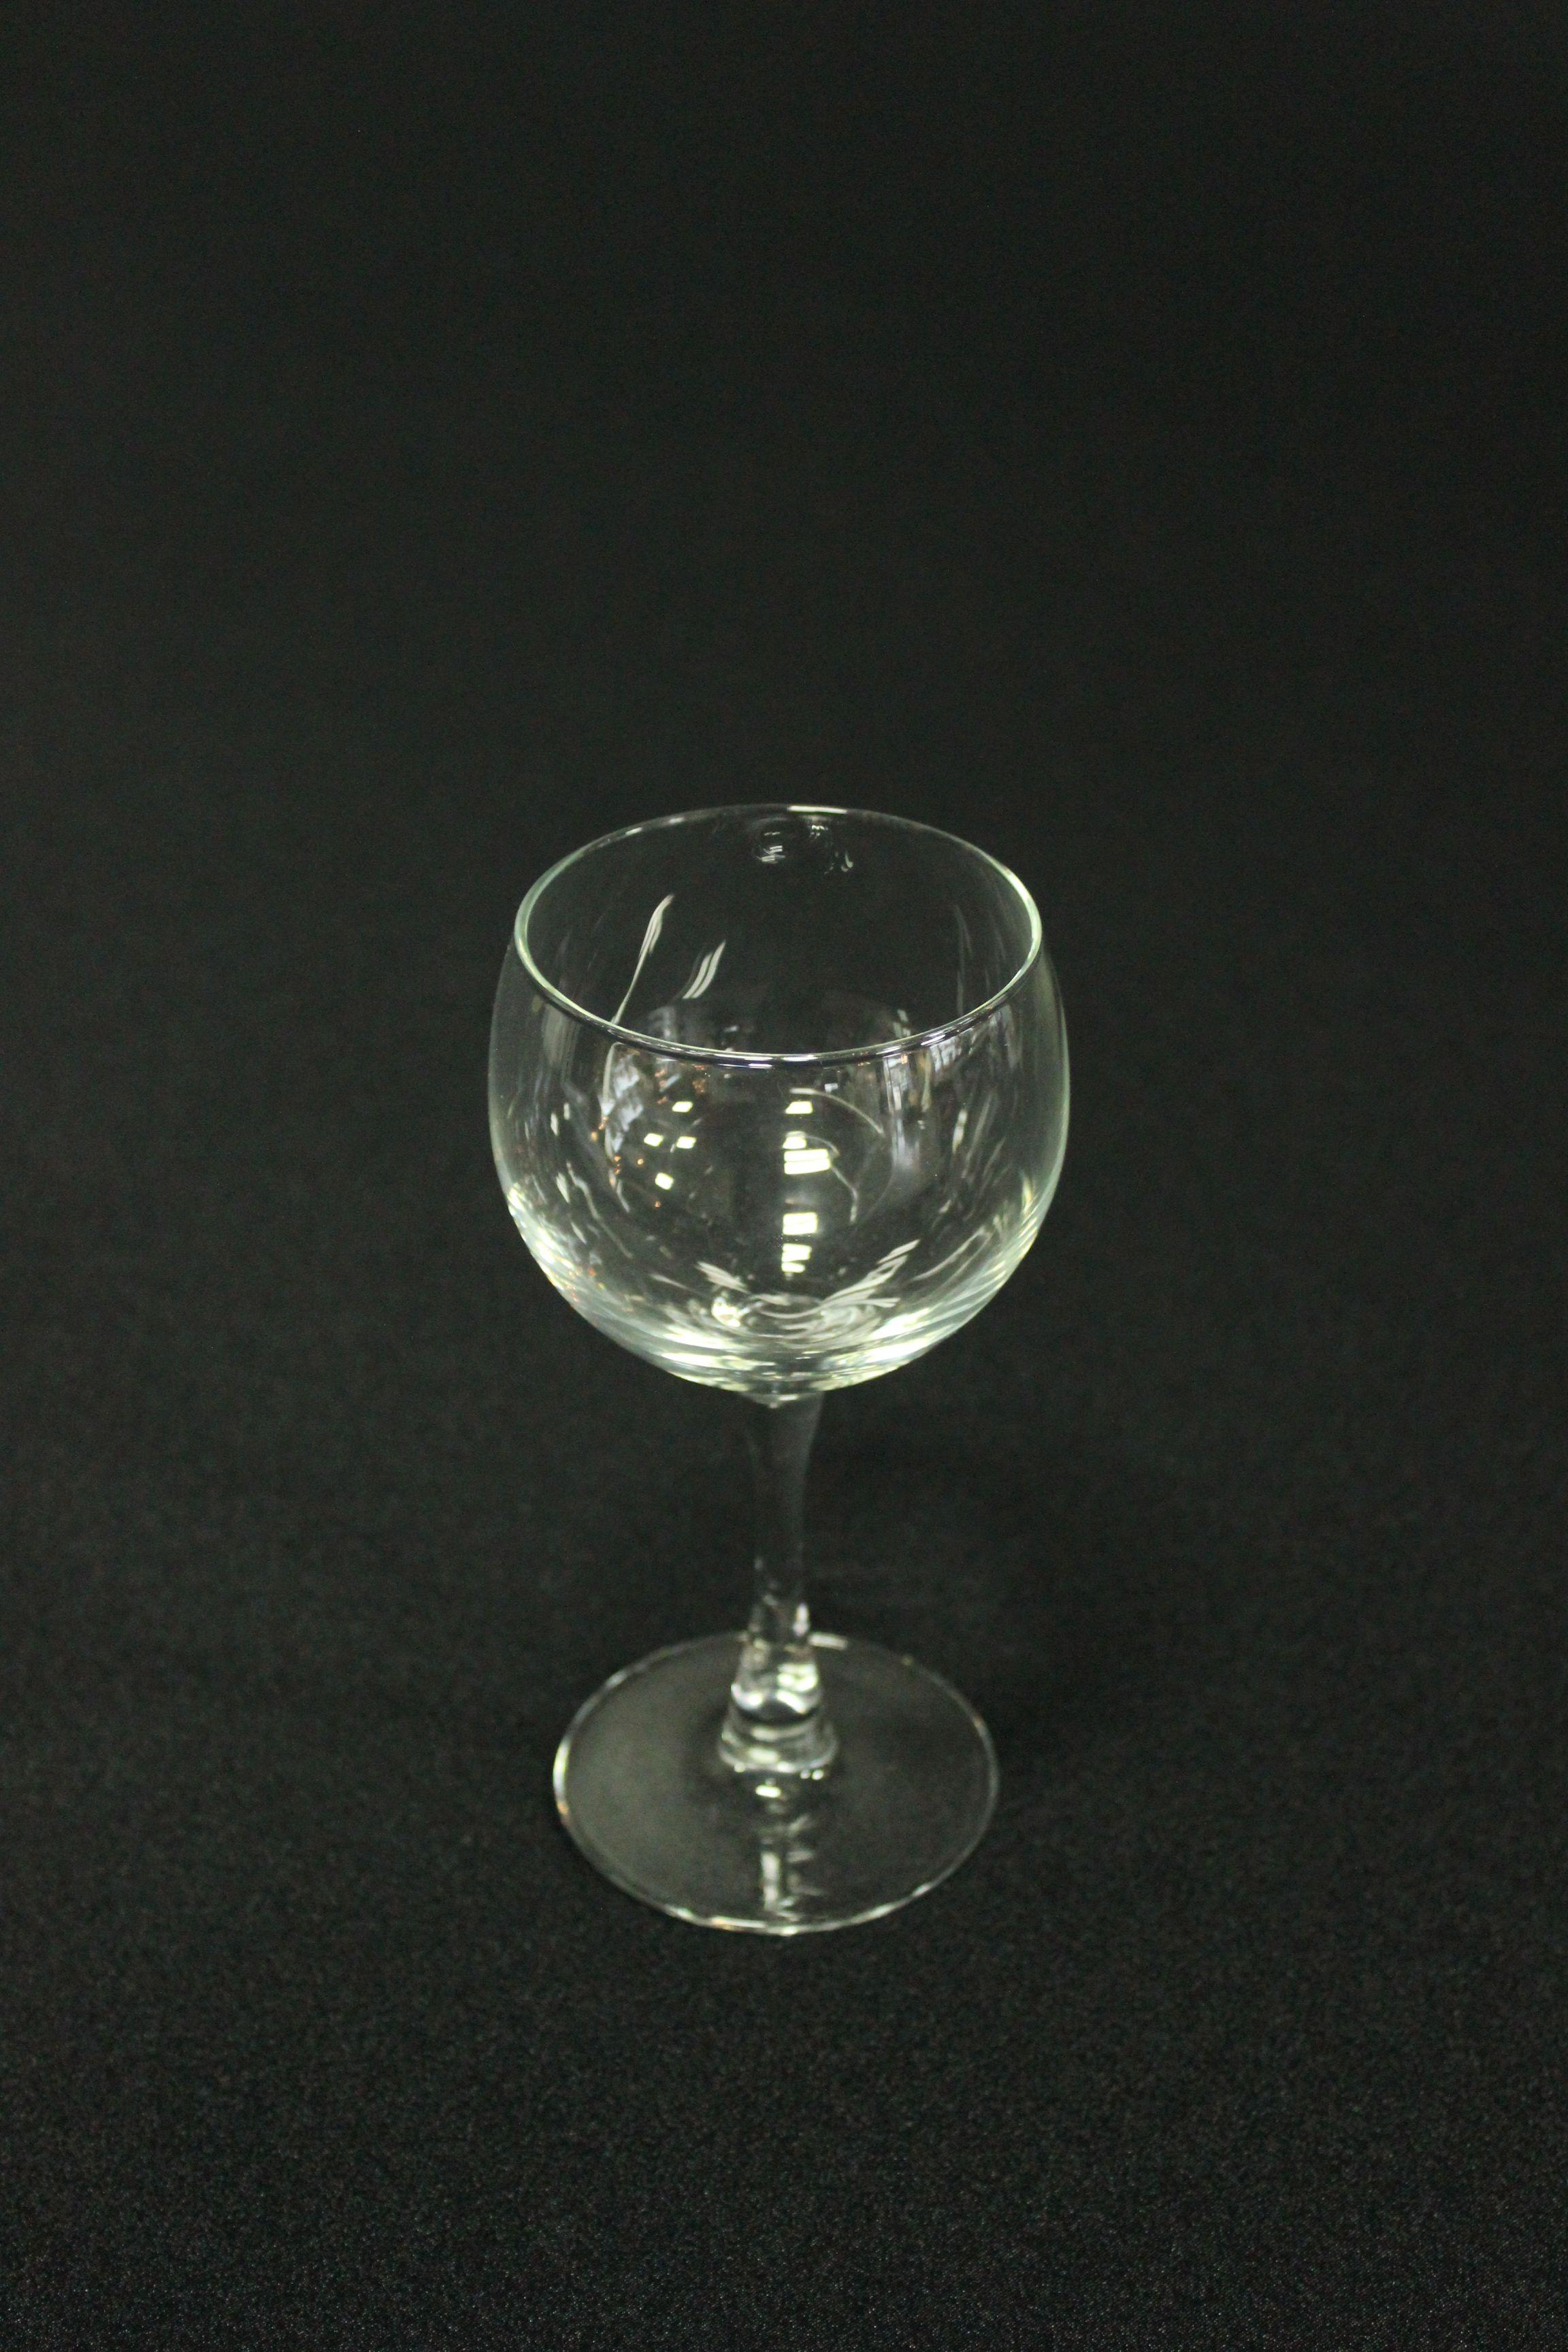 Plain wine glass